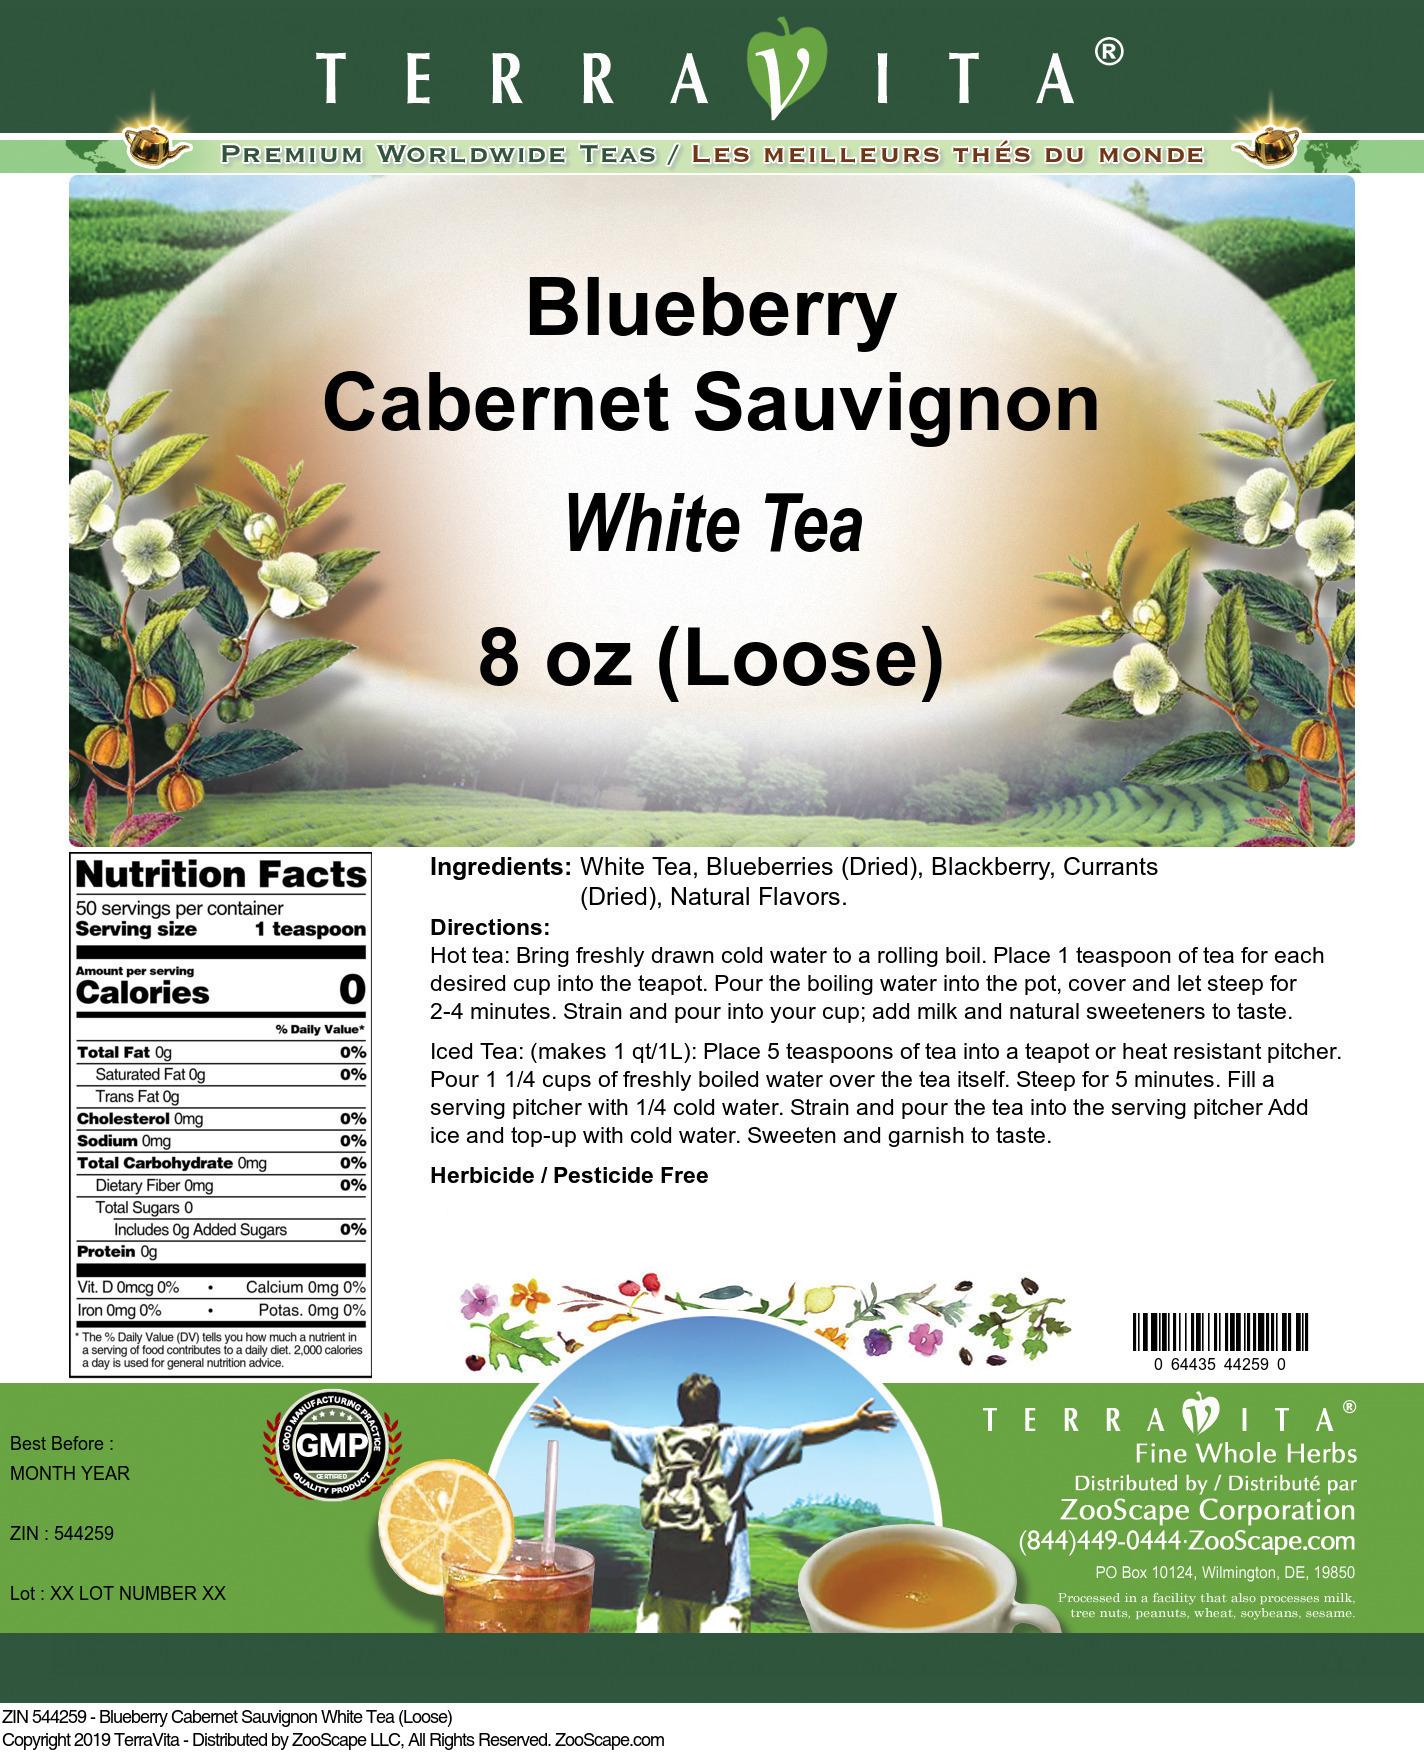 Blueberry Cabernet Sauvignon White Tea (Loose)